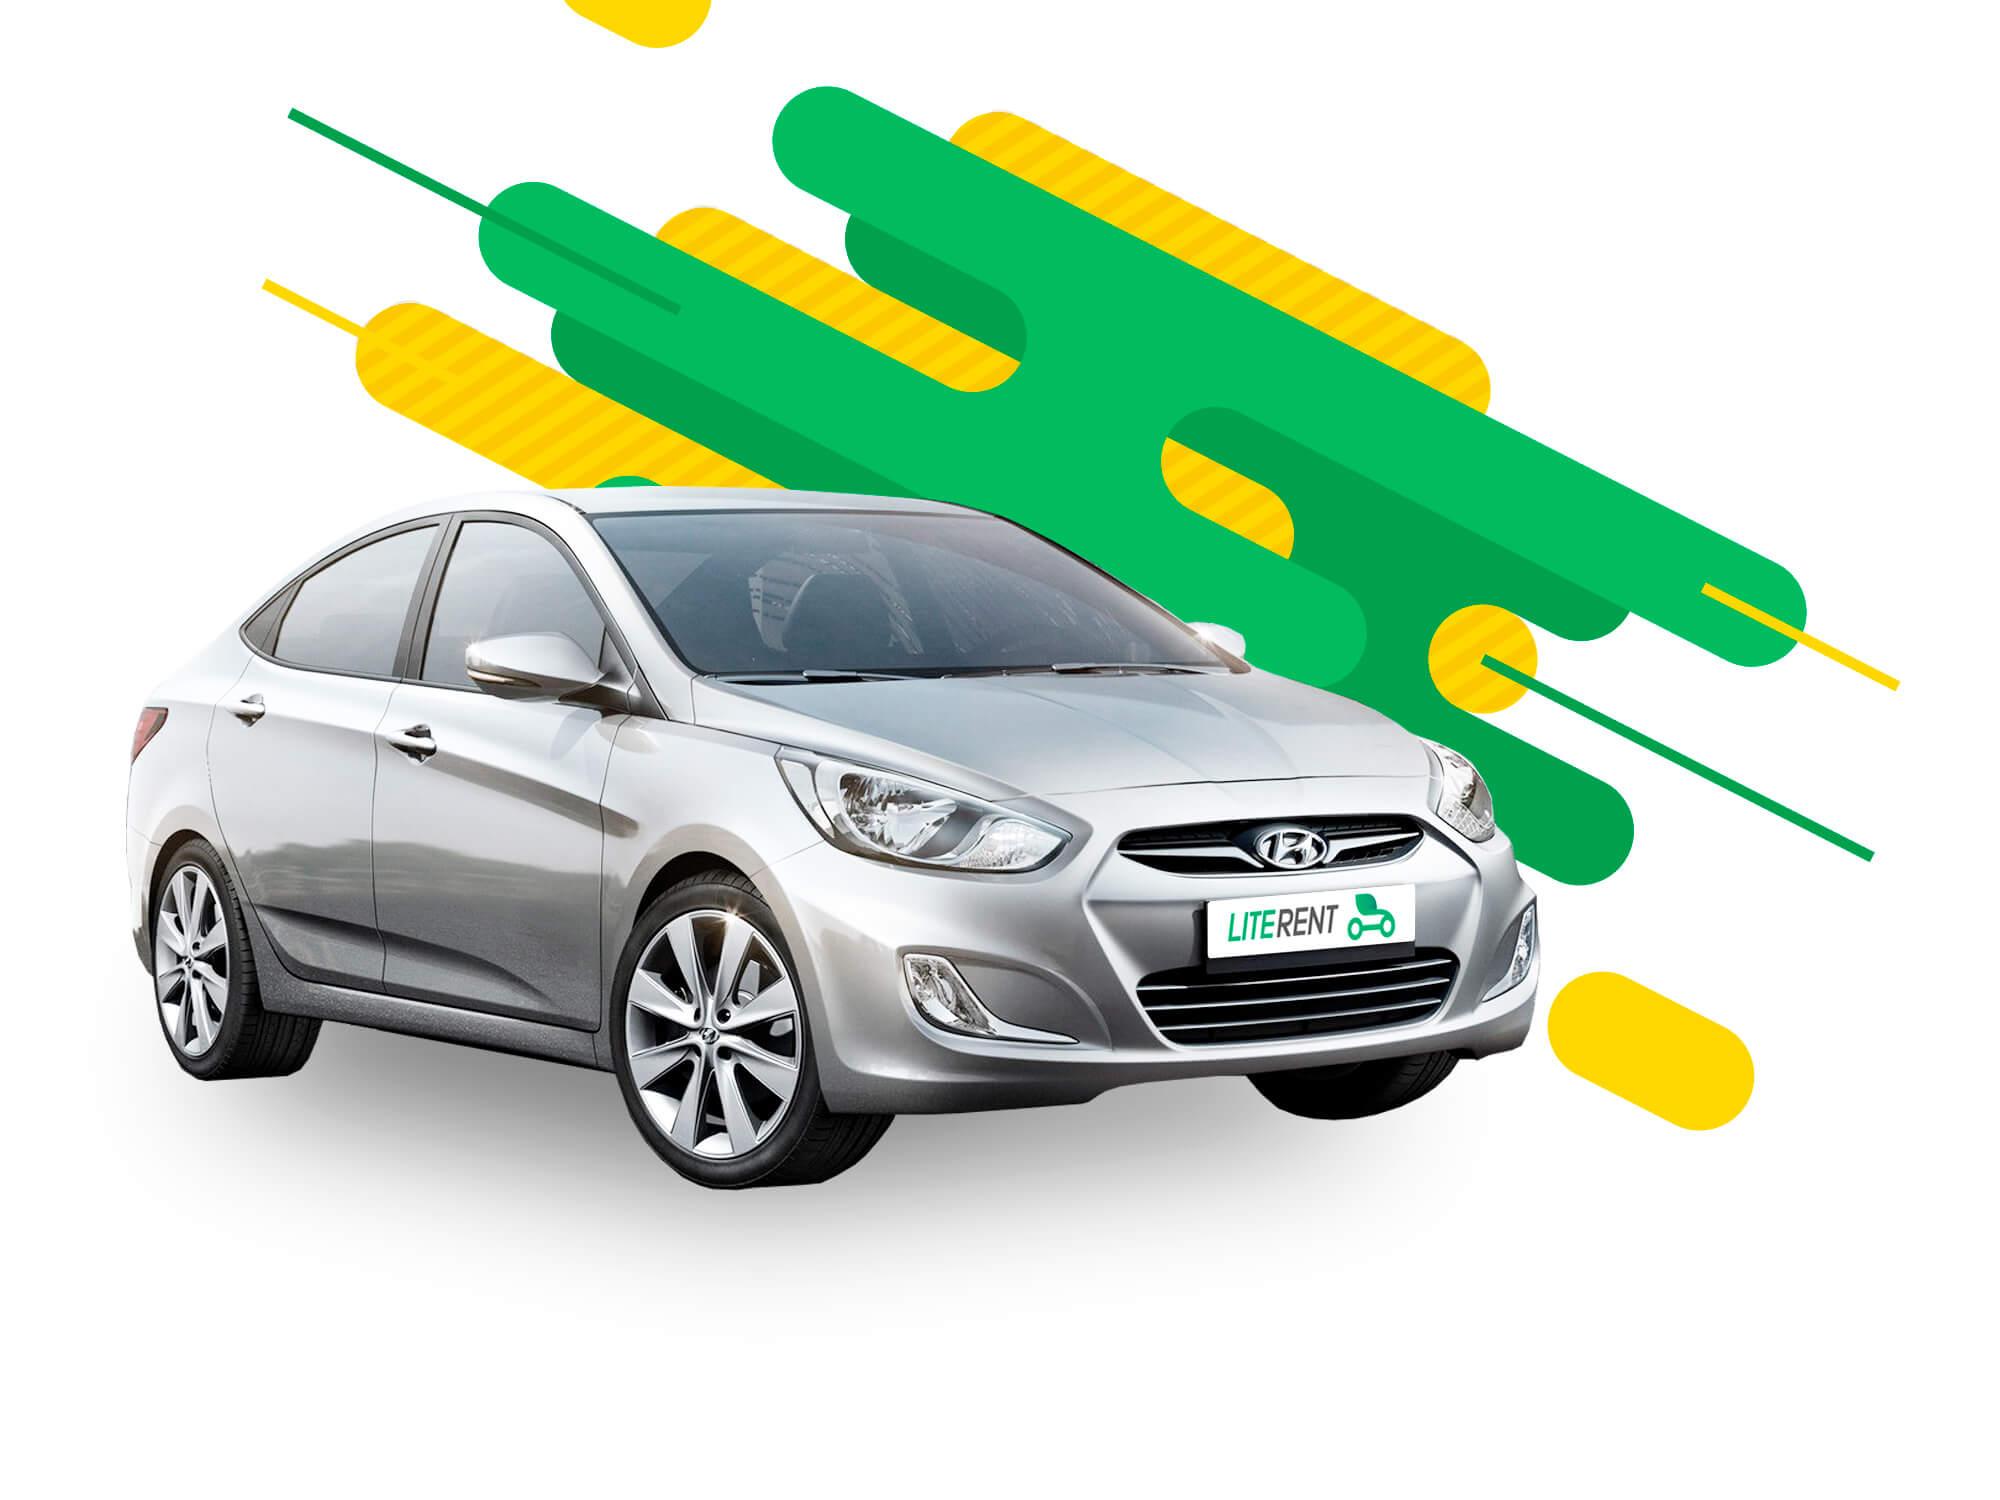 Hyundai Solaris 1.6 (Silver)